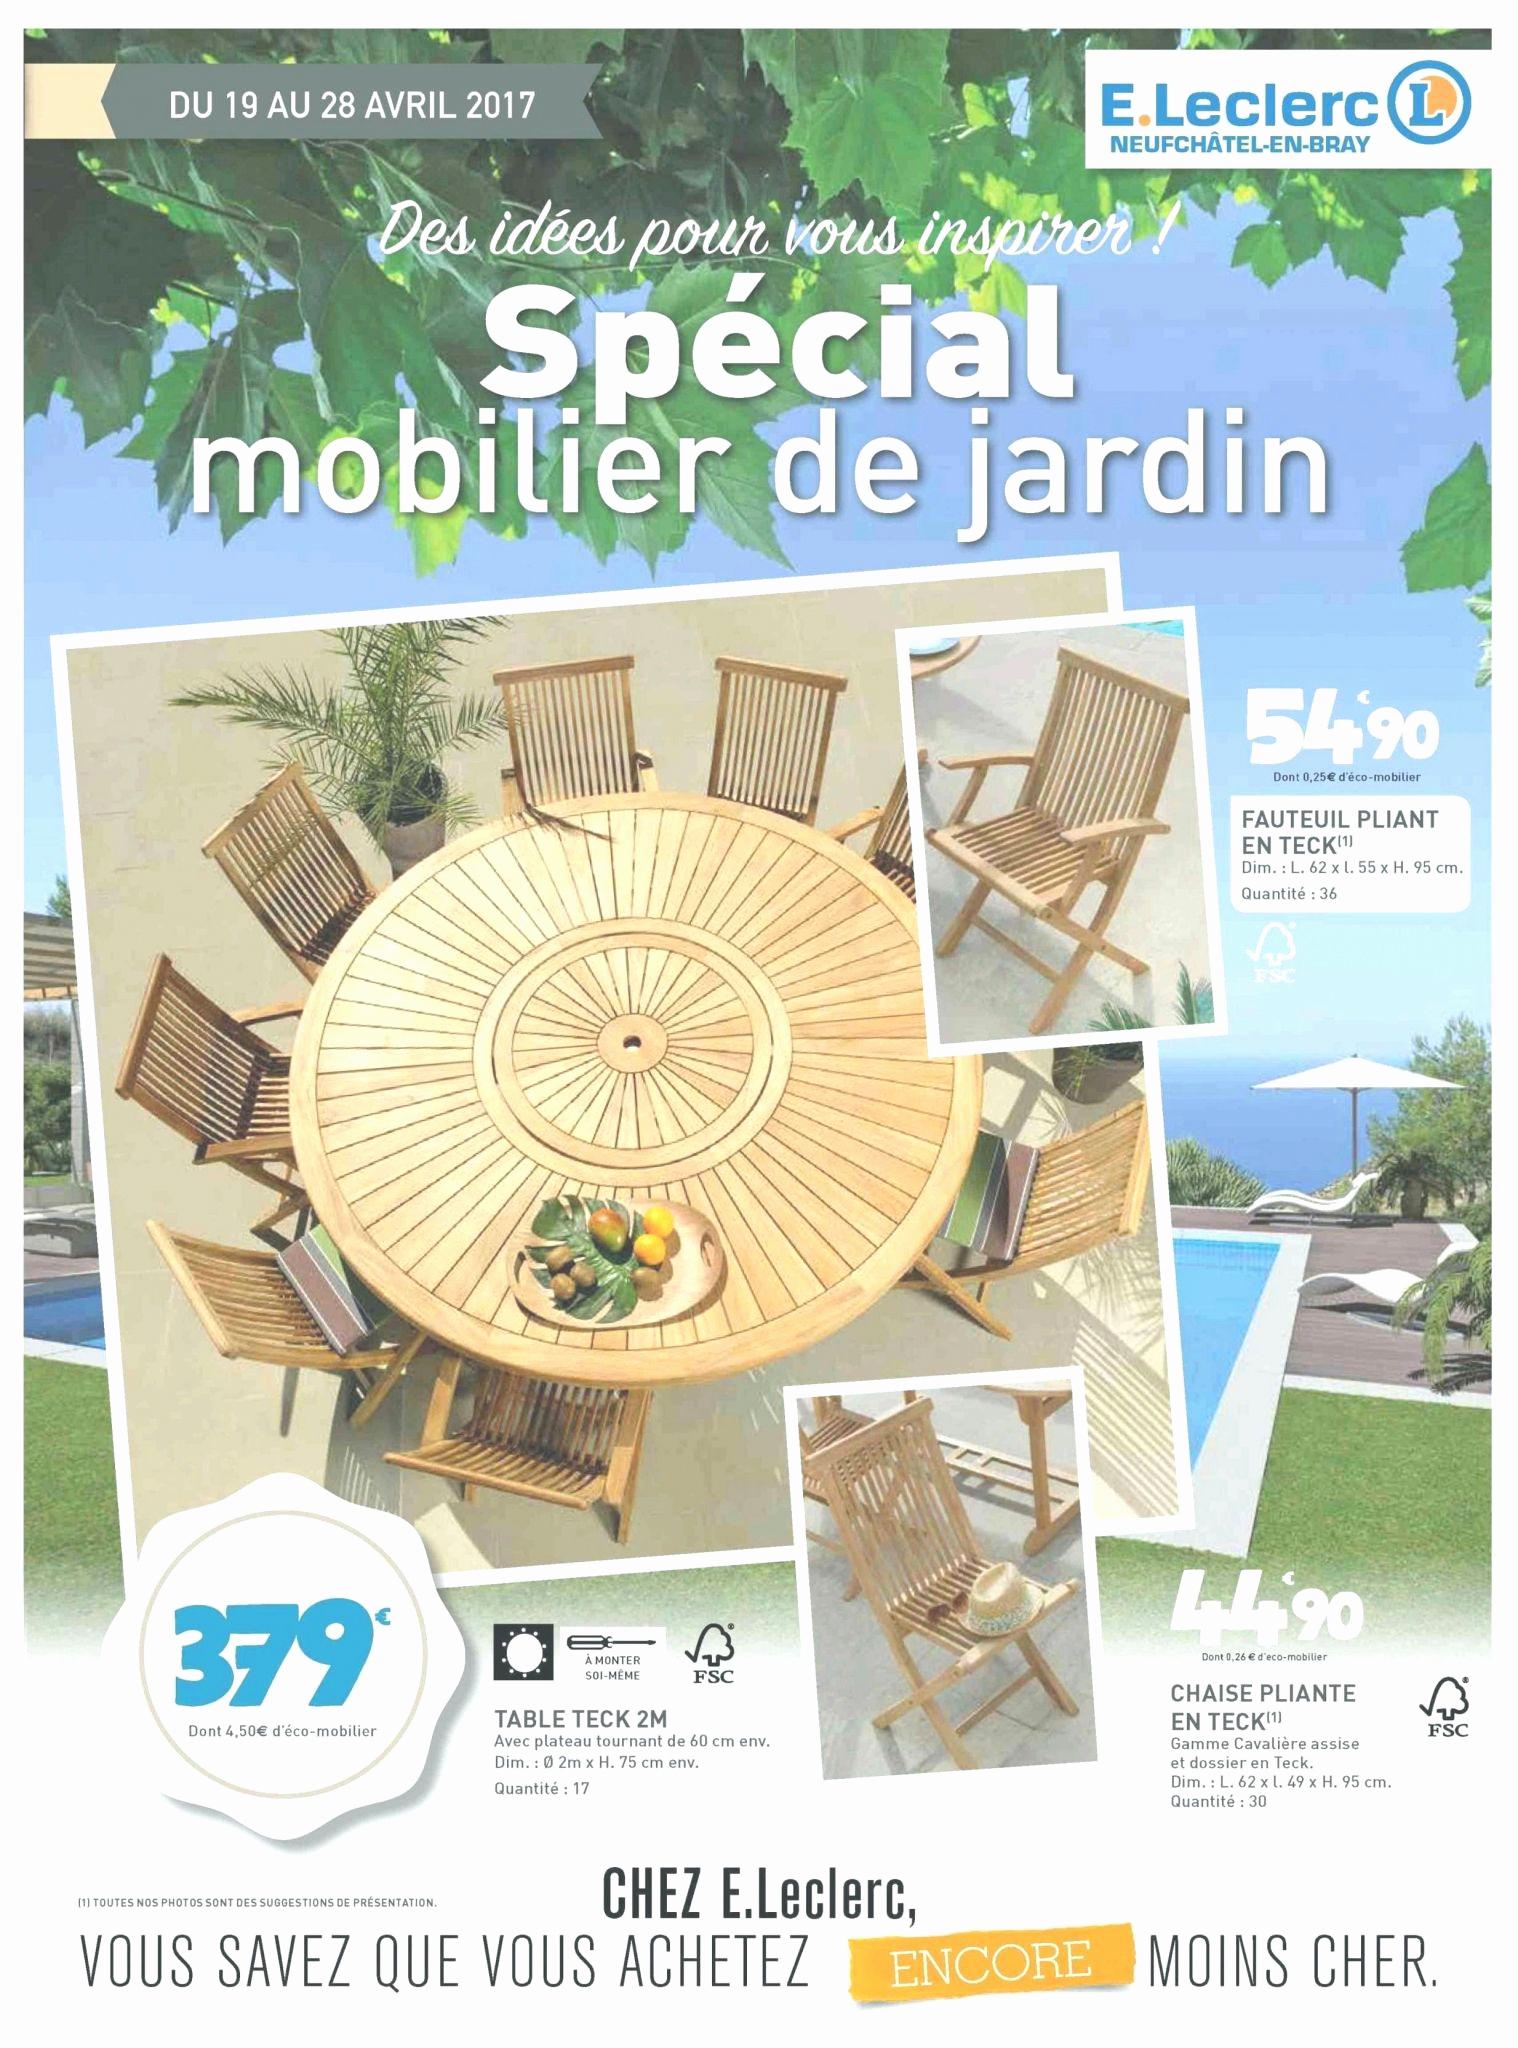 68 Beau Salon De Jardin Resine Carrefour Wallpaper On ... intérieur Salon De Jardin En Résine Tressée Leclerc